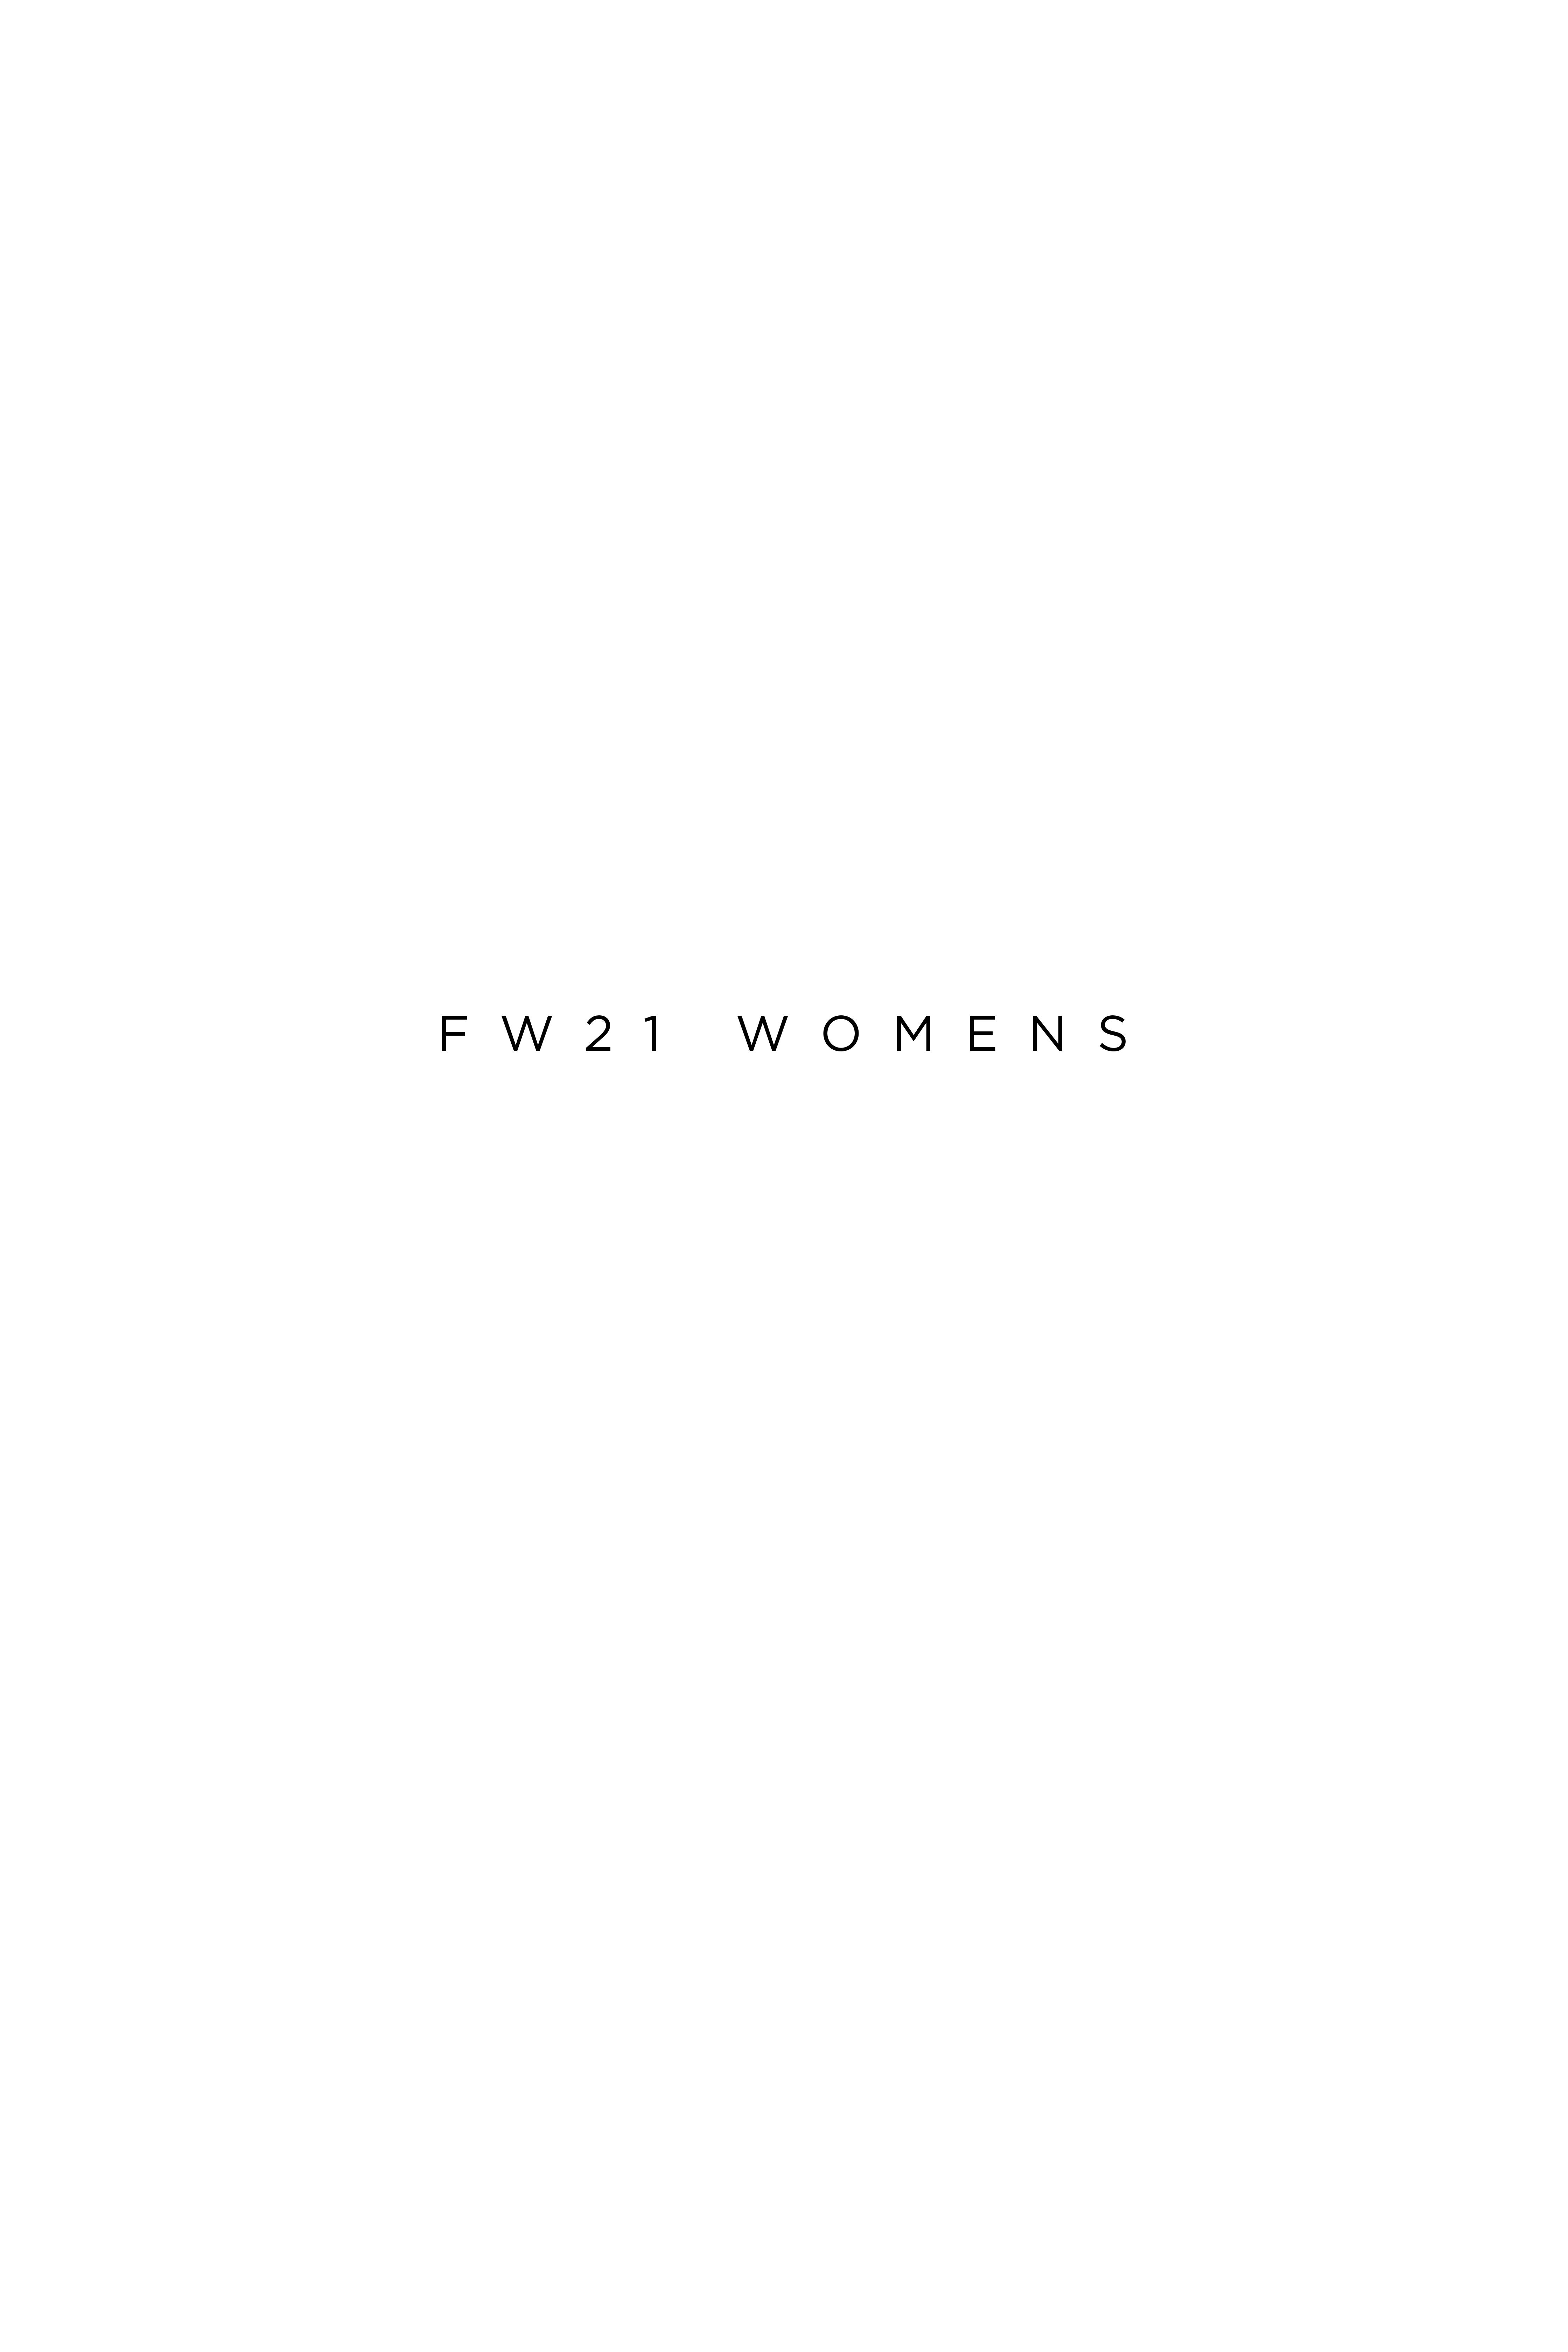 Fw21 womens